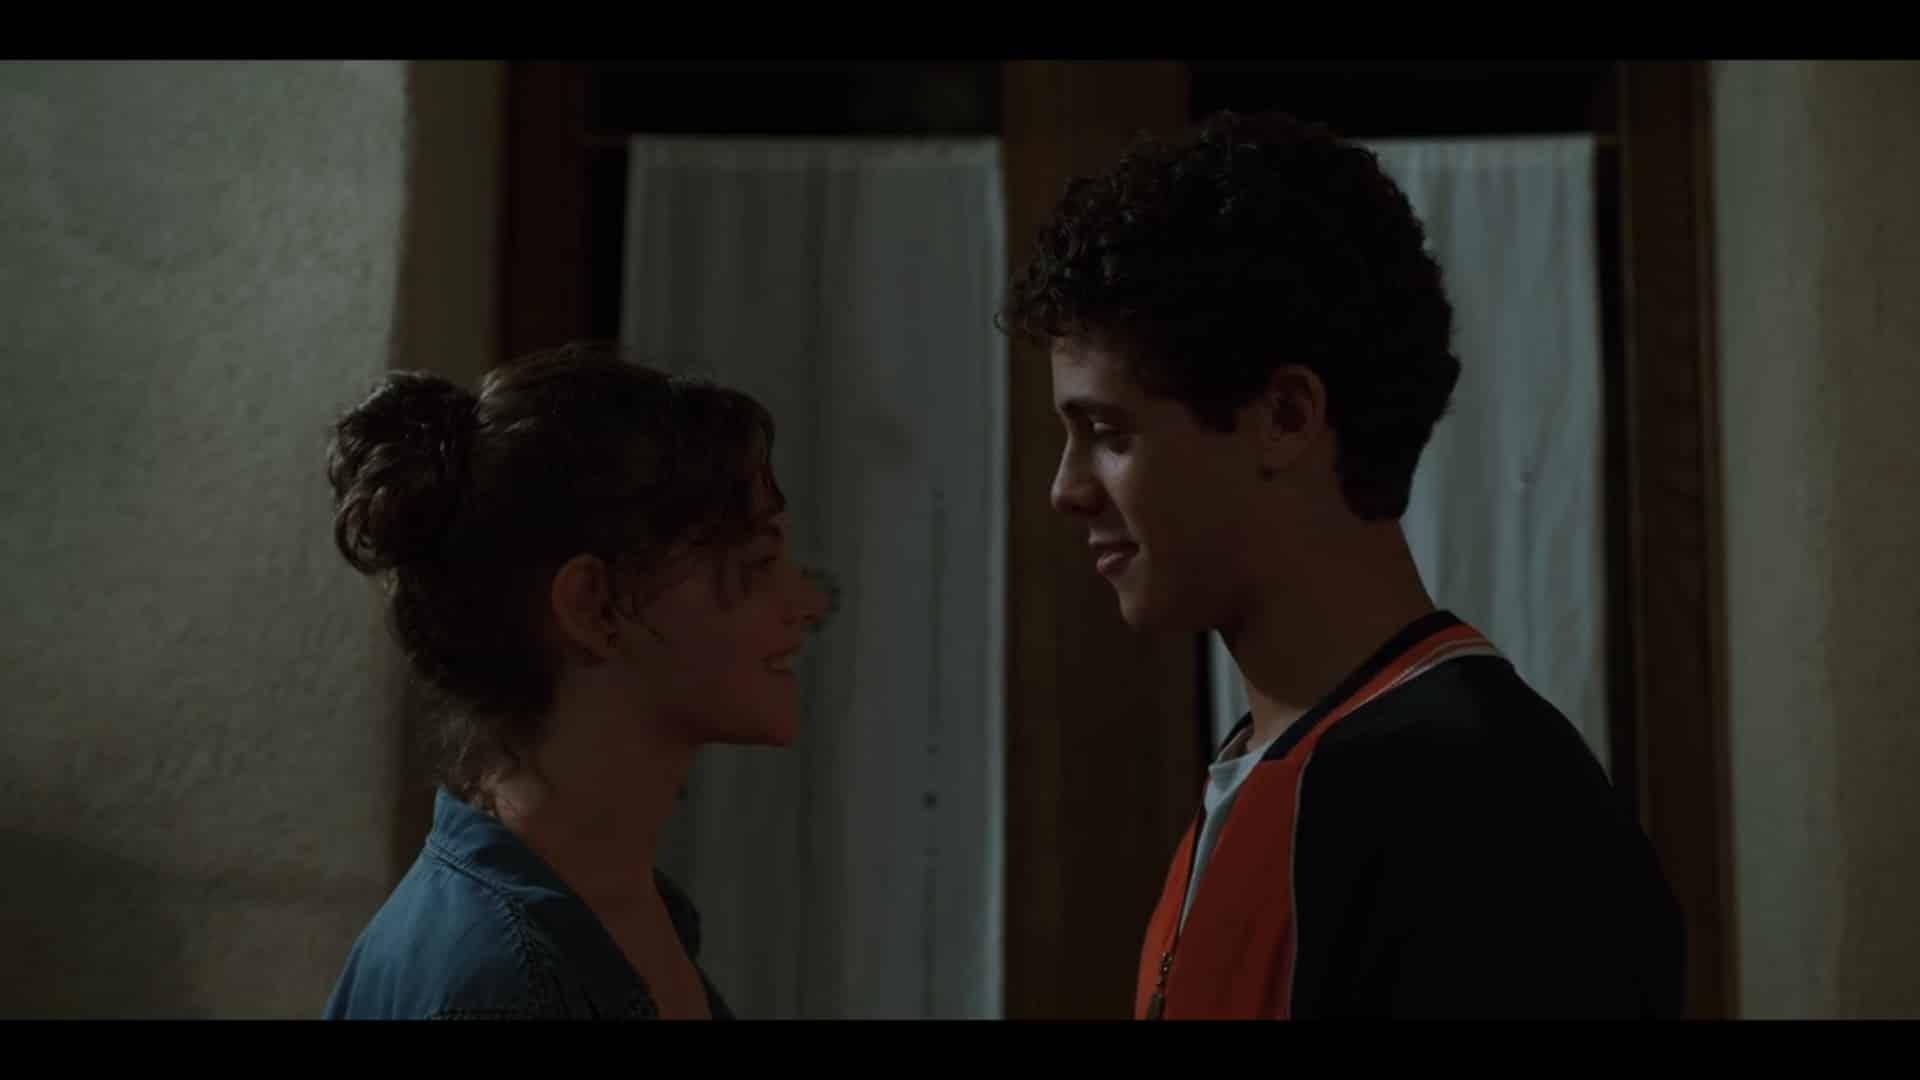 Sara (Elvira Camarrone) and Lorenzo (Roberto Christian) before their first kiss